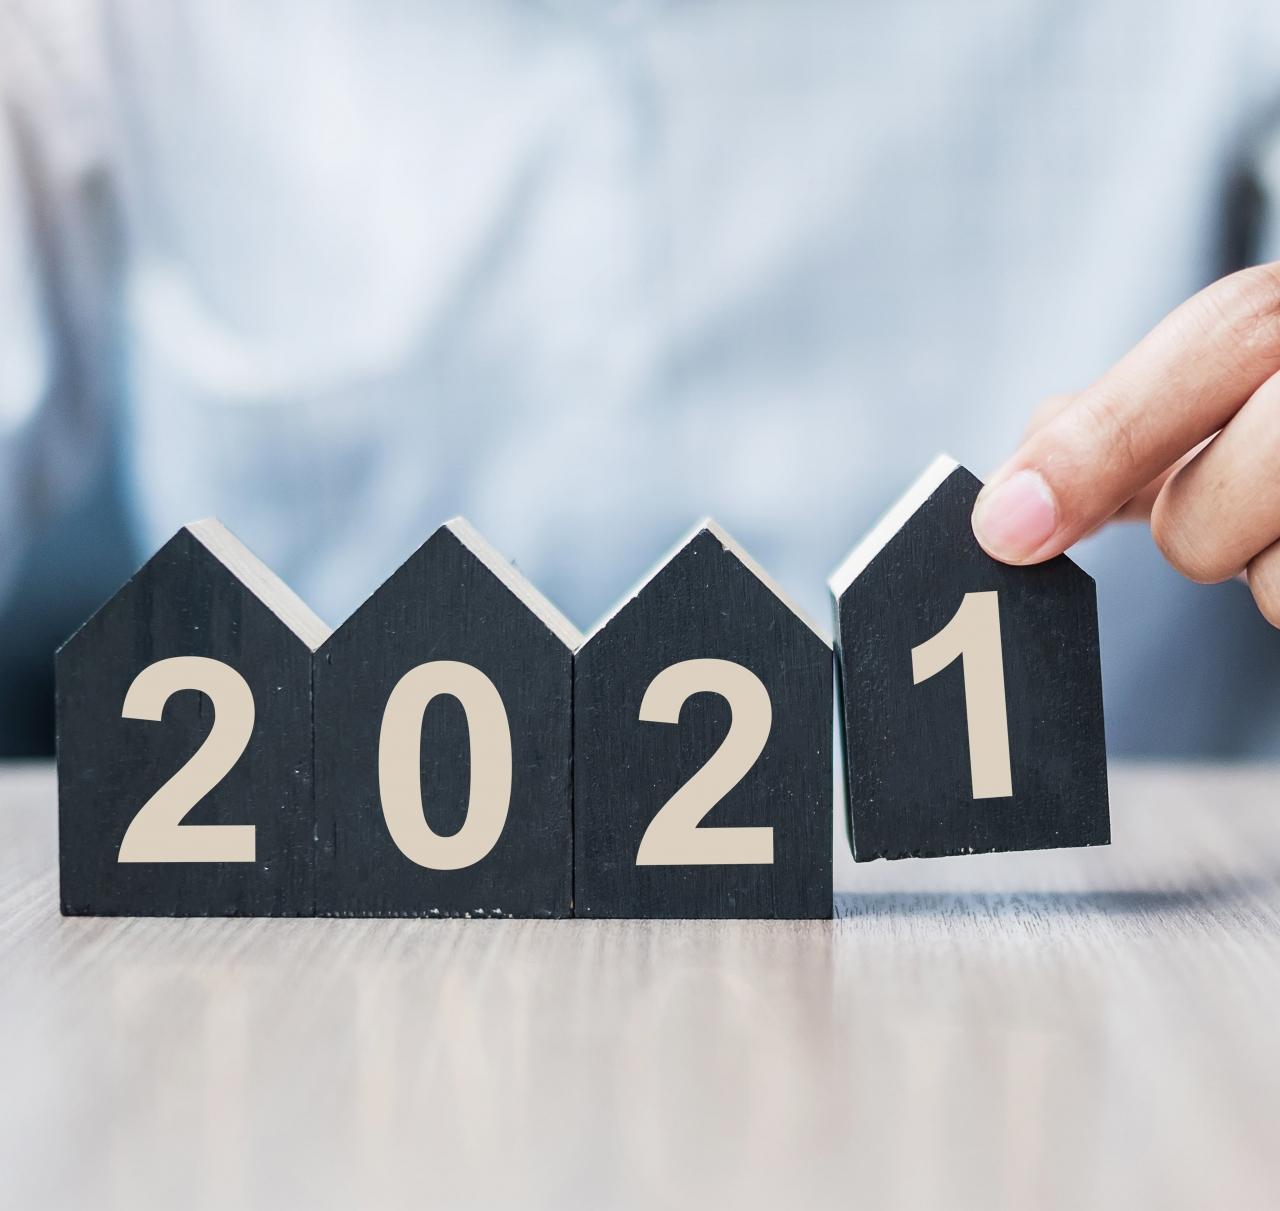 >Housing market in Maidstone in 2021